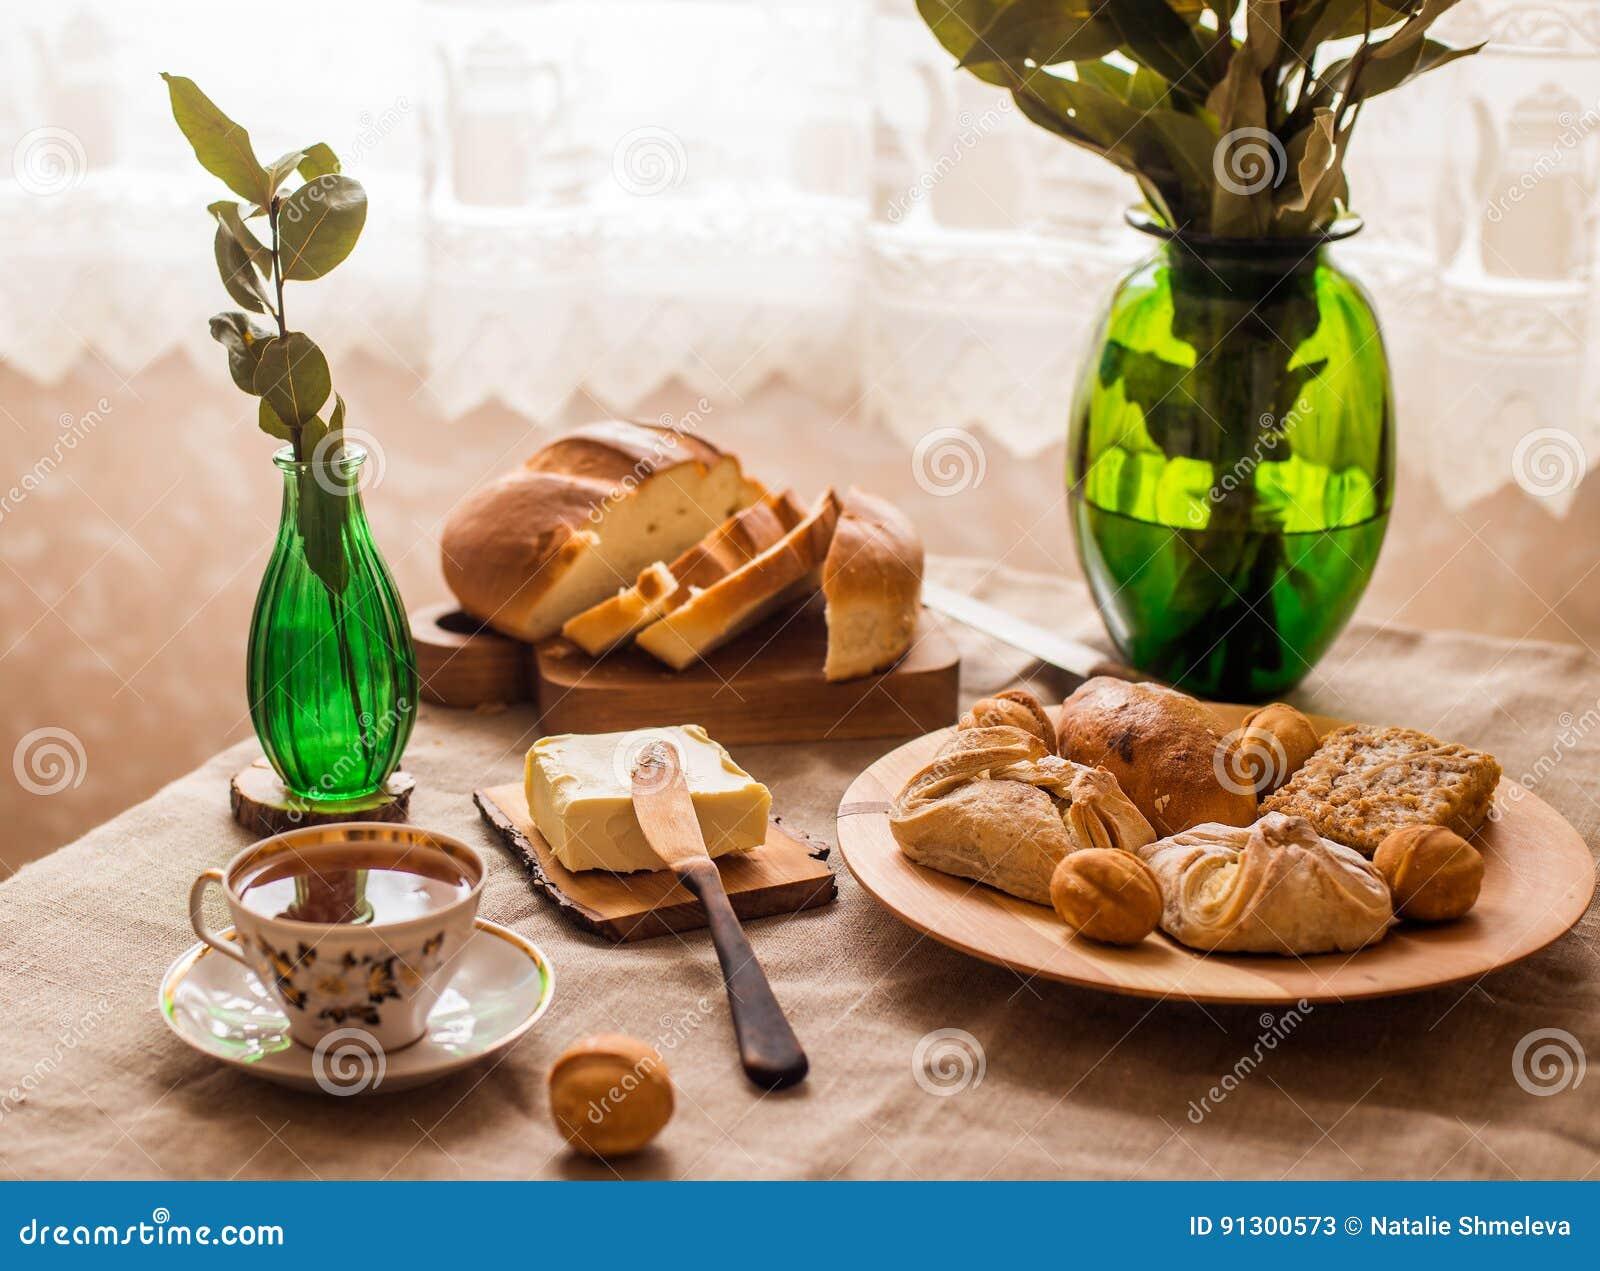 Tasty home breakfast